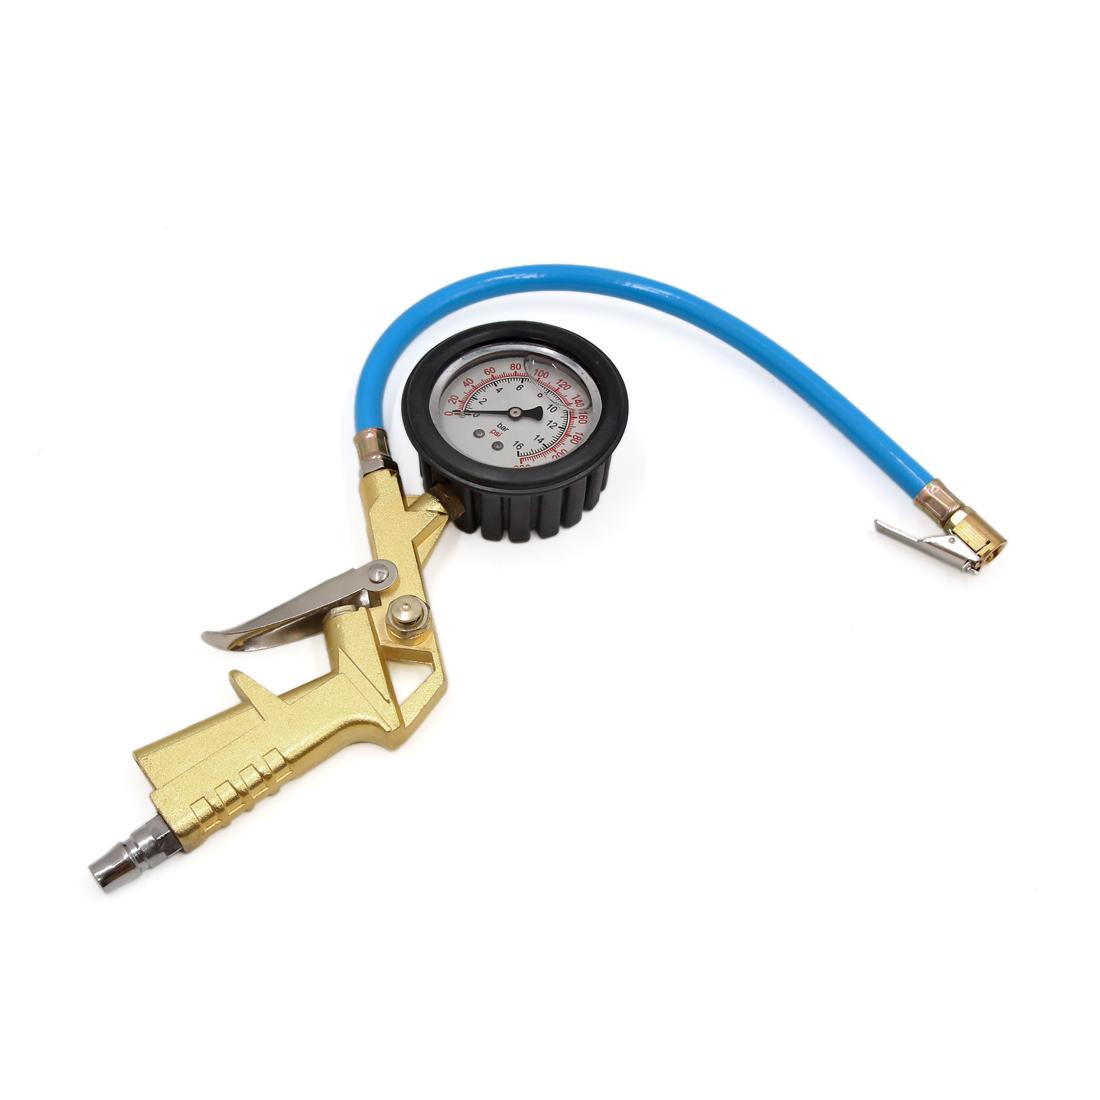 0-230Psi 0-16Bar Car Motorcycle Tire Inflator Gun Round Dial Air Pressure Gauge